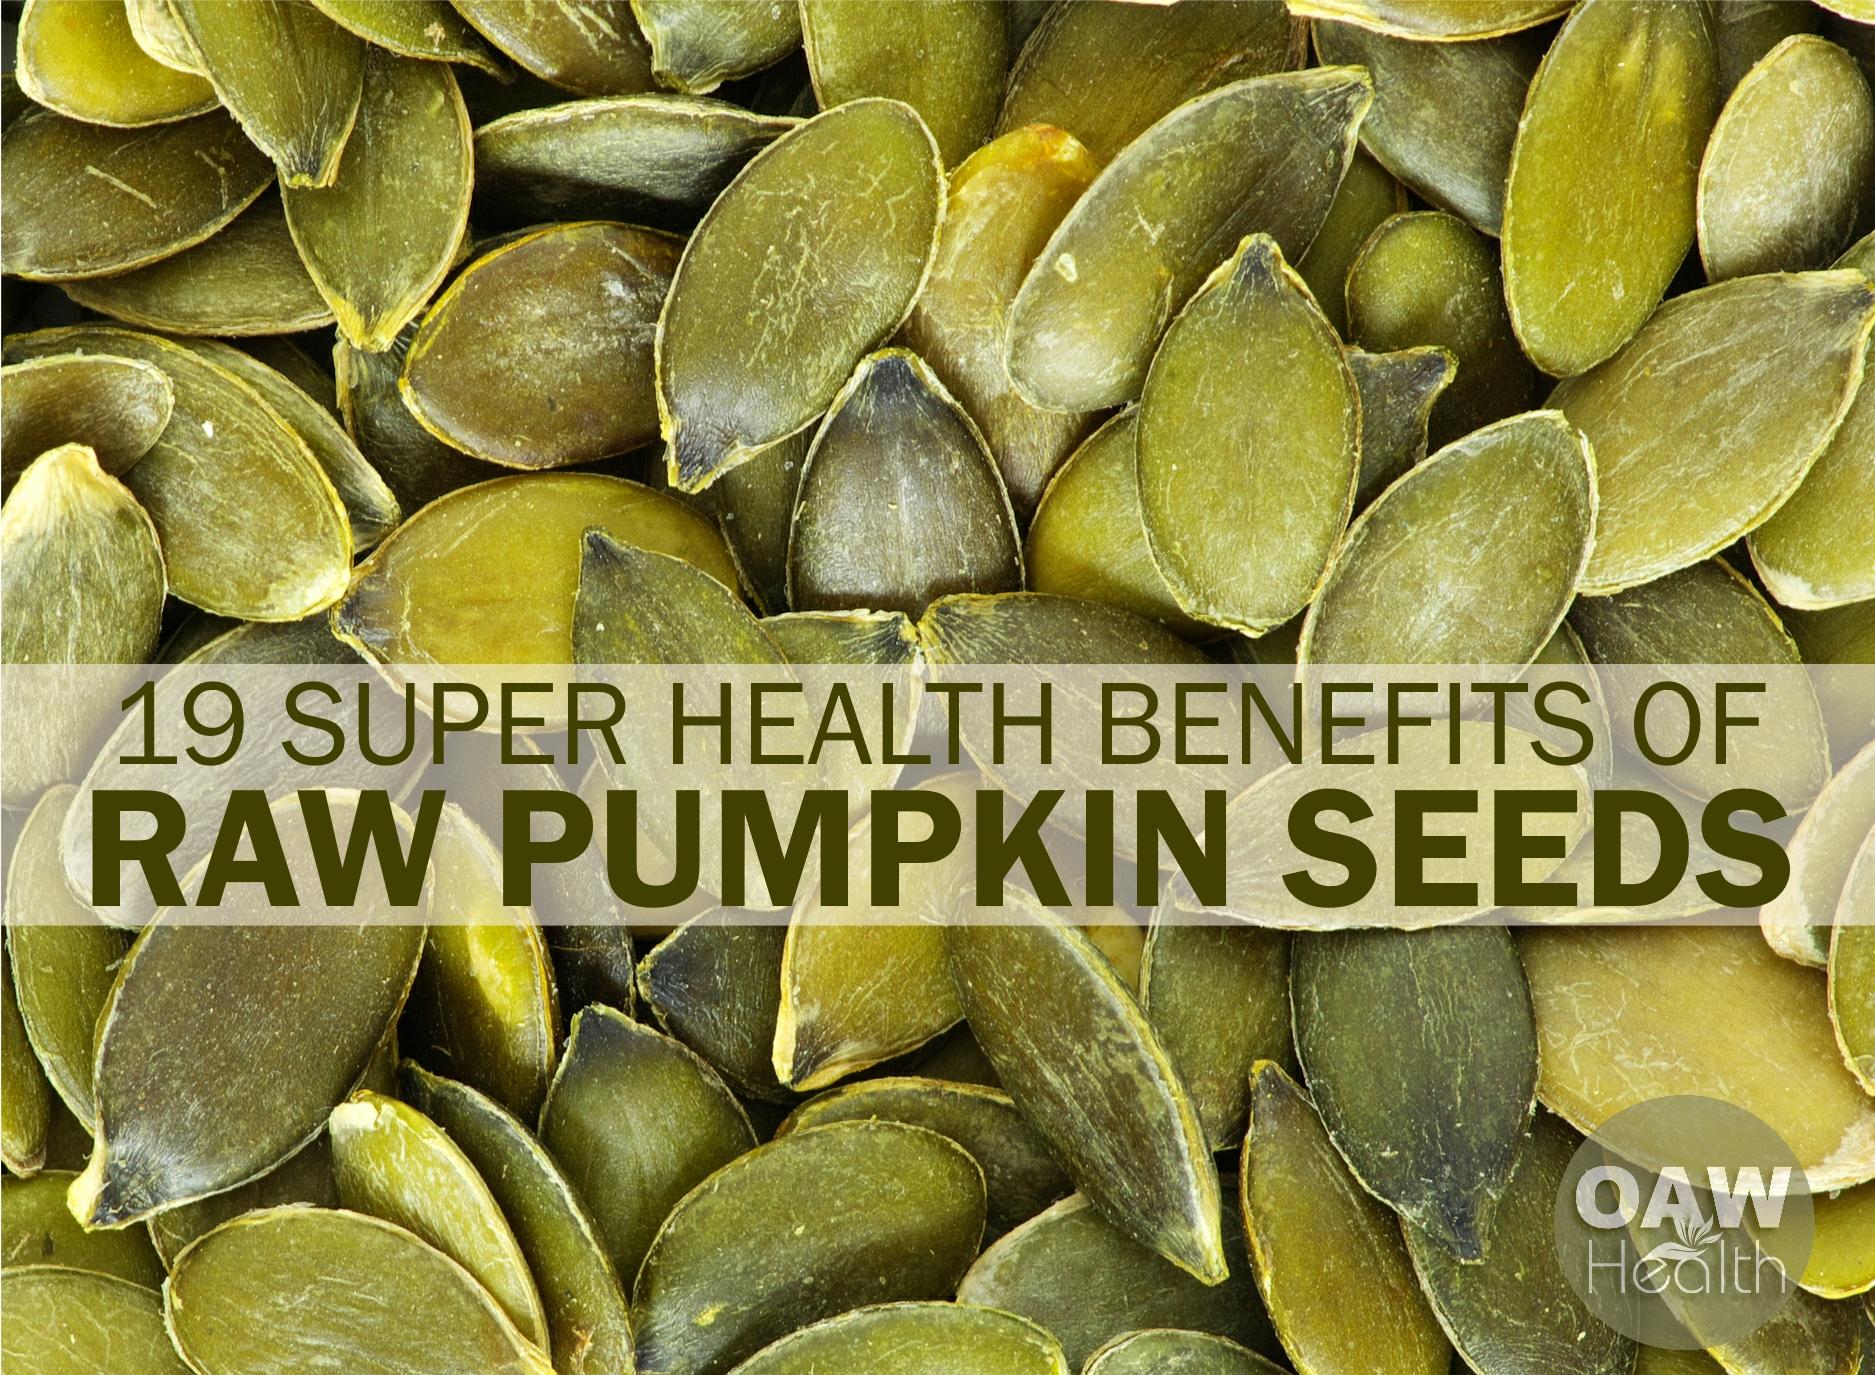 19 Super Health Benefits of Raw Pumpkin Seeds